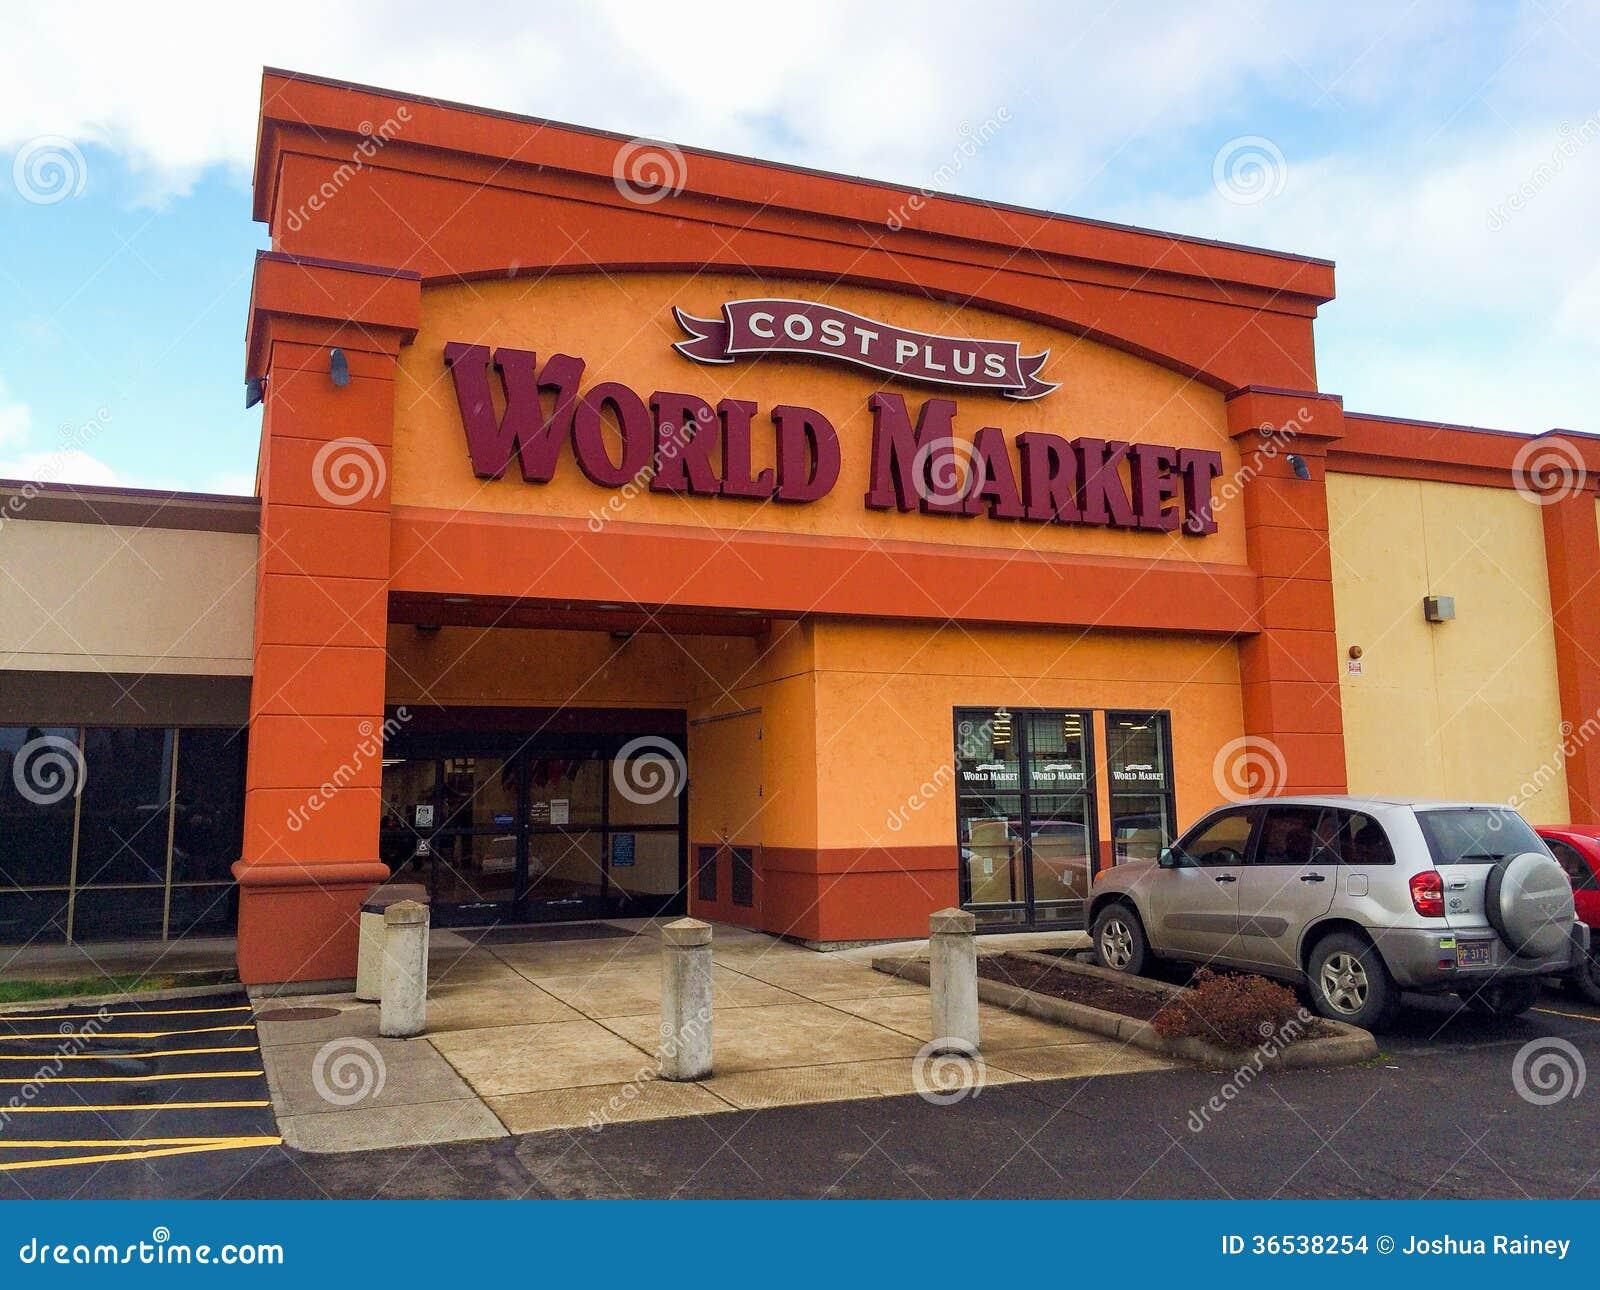 recipe  world market food locations  9. world market food locations